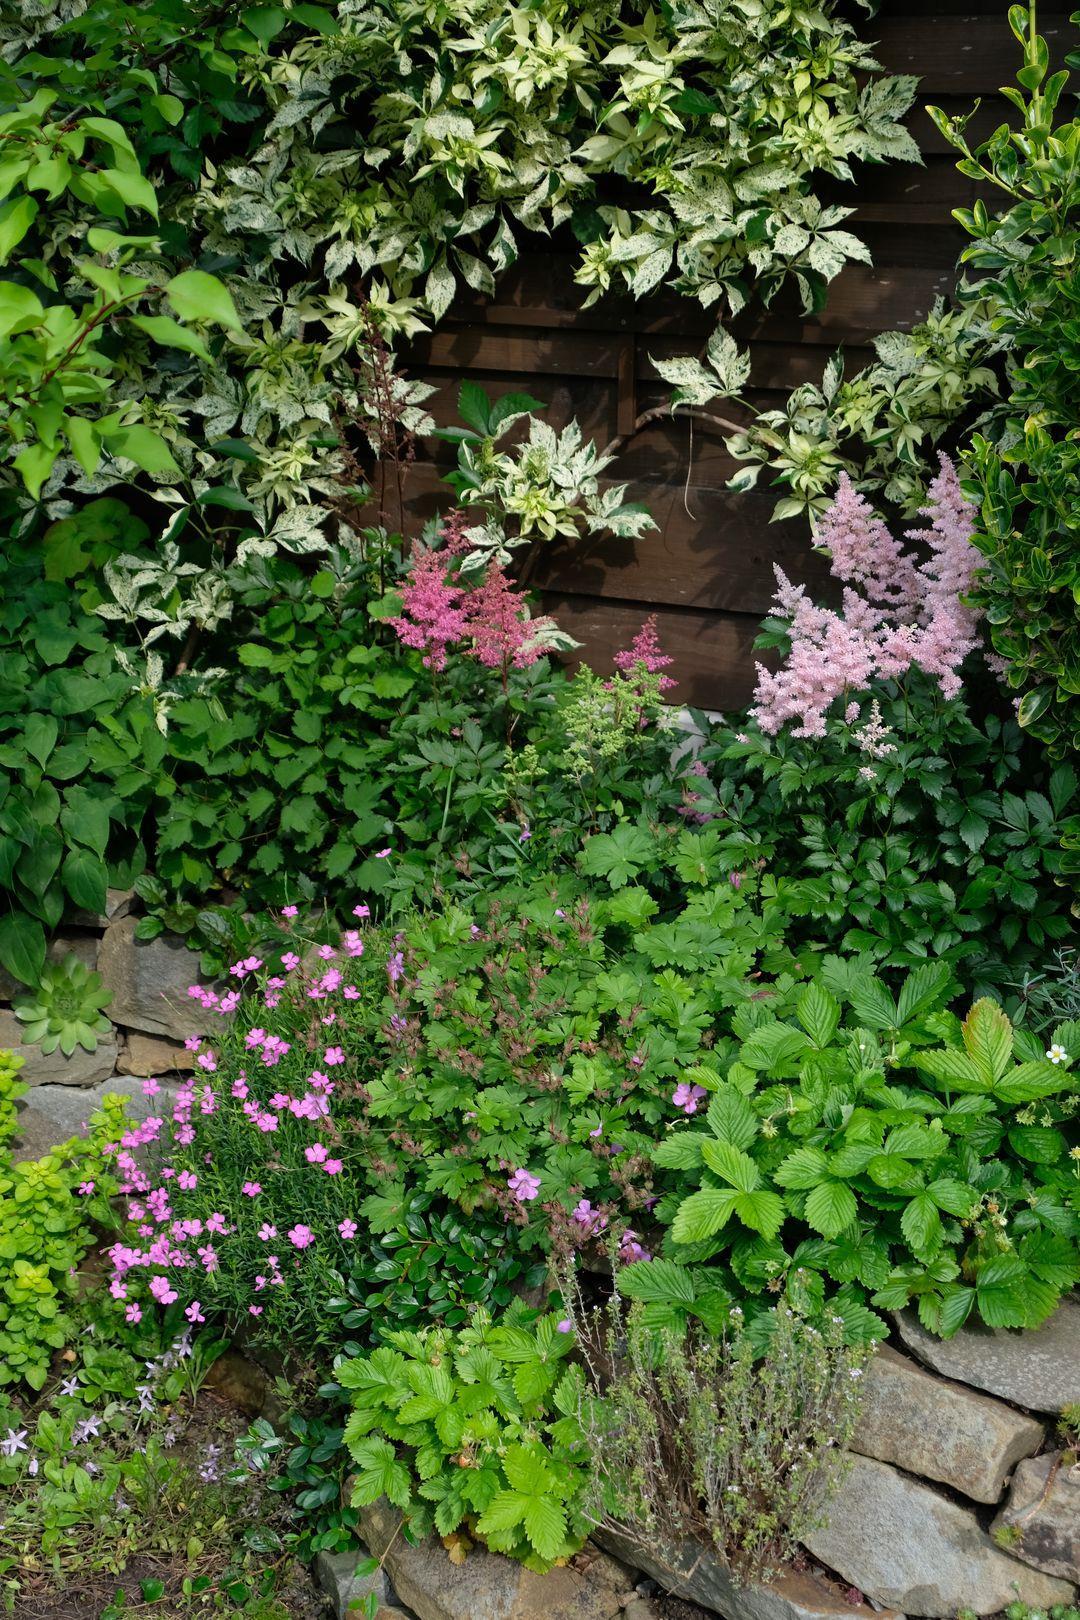 Naša záhradka 2020 - Cechravy uz tiez vykvitli.